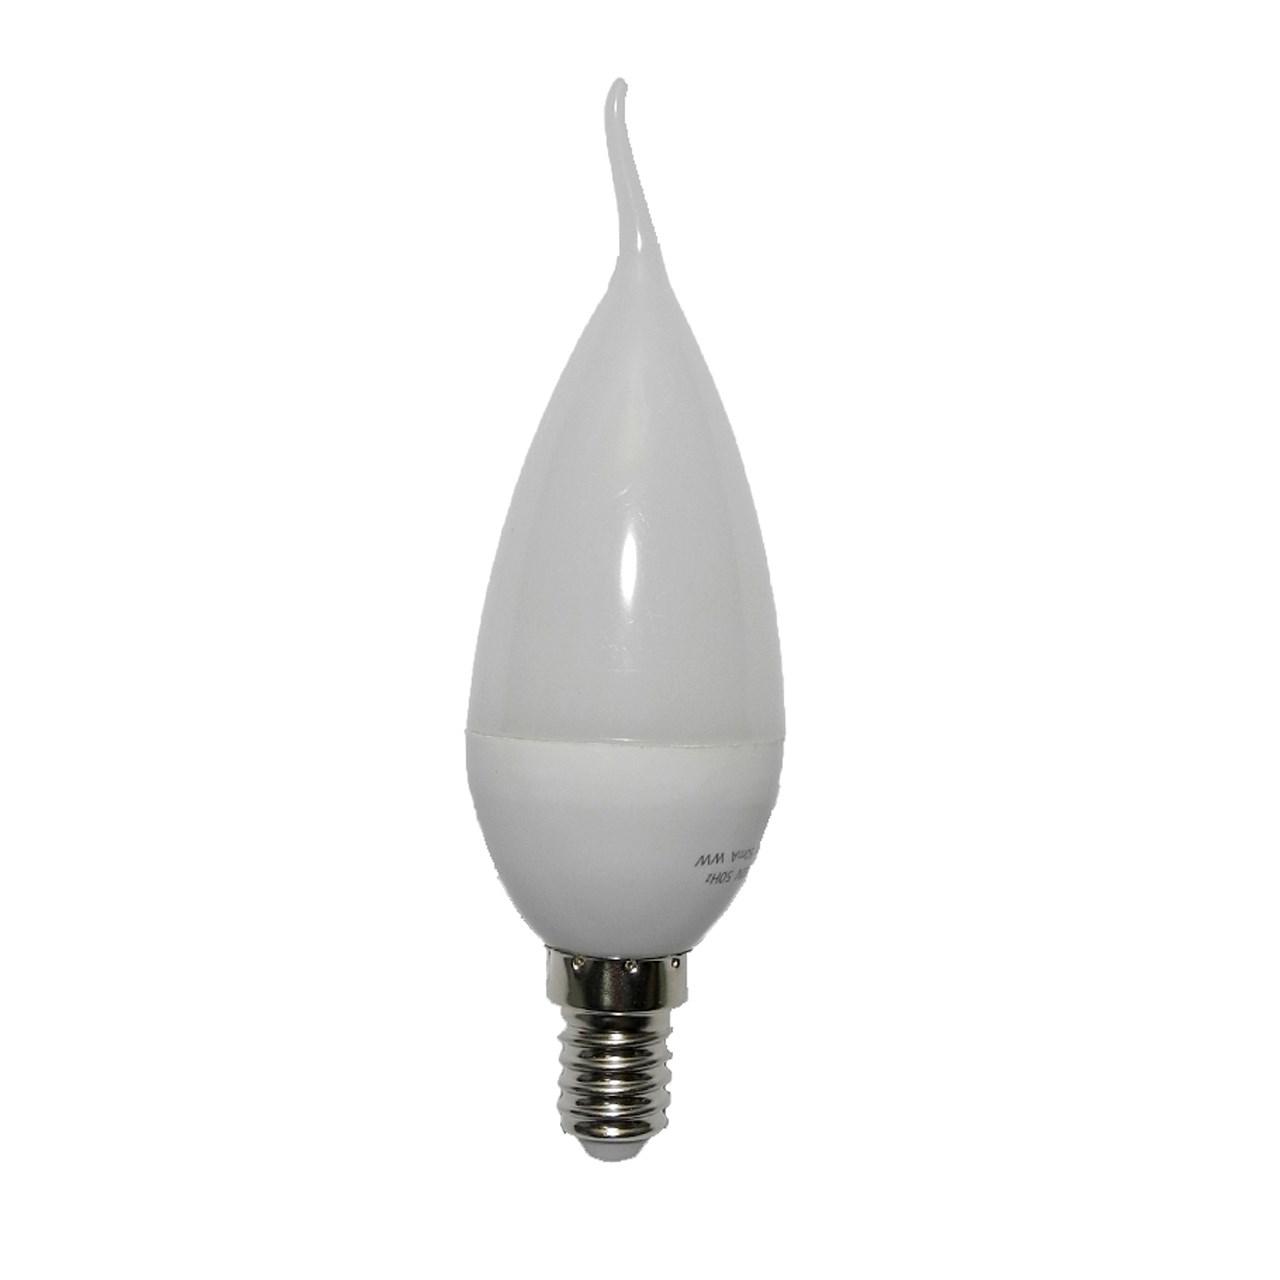 لامپ ال ای دی 6 وات شمعی اشکی خزرشید پایه E14